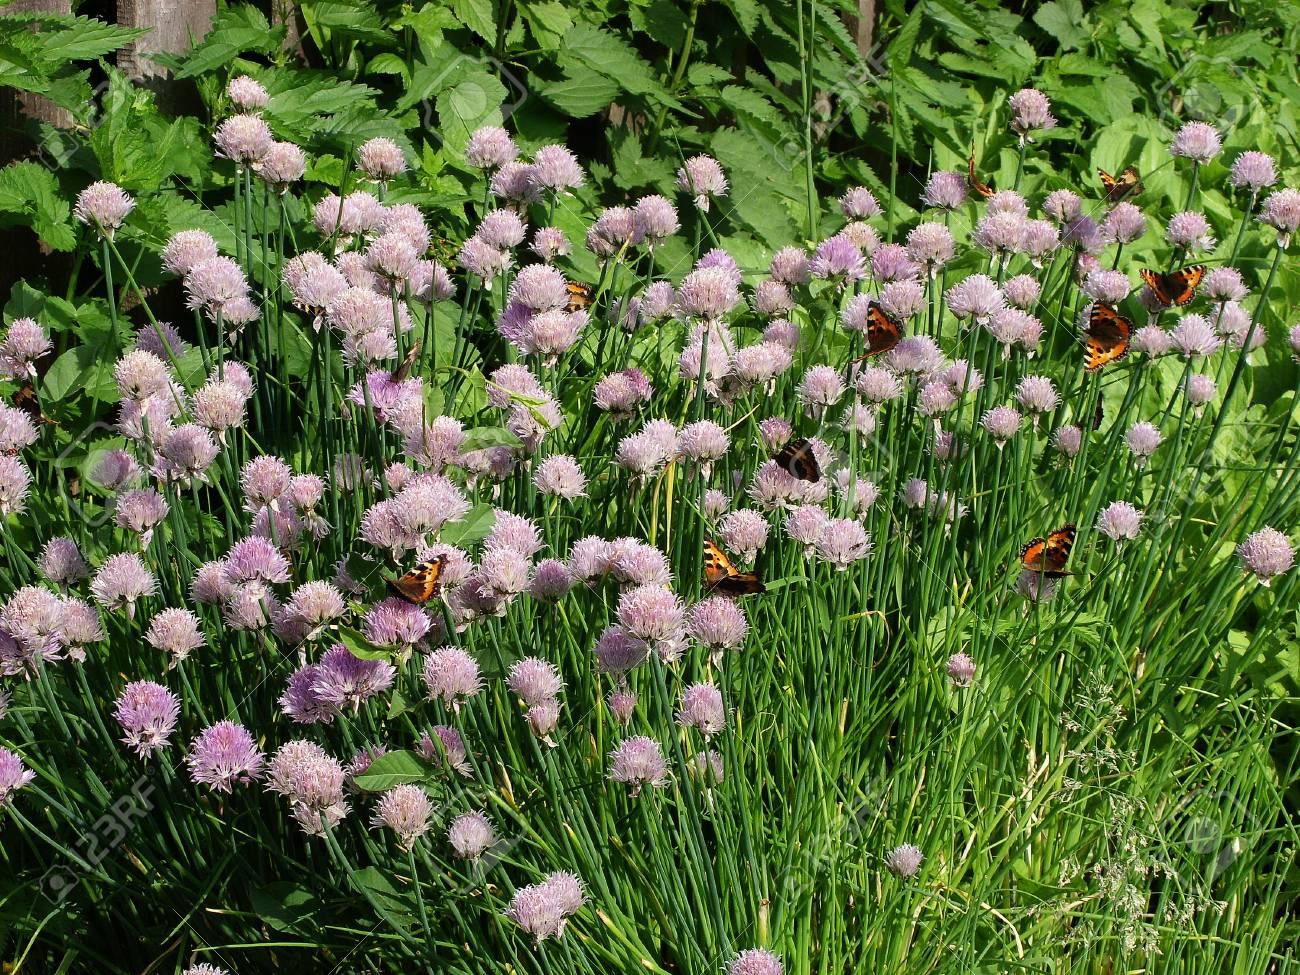 Orange butterflies sit on inflorescences with seeds of bulbous plants - 74615805